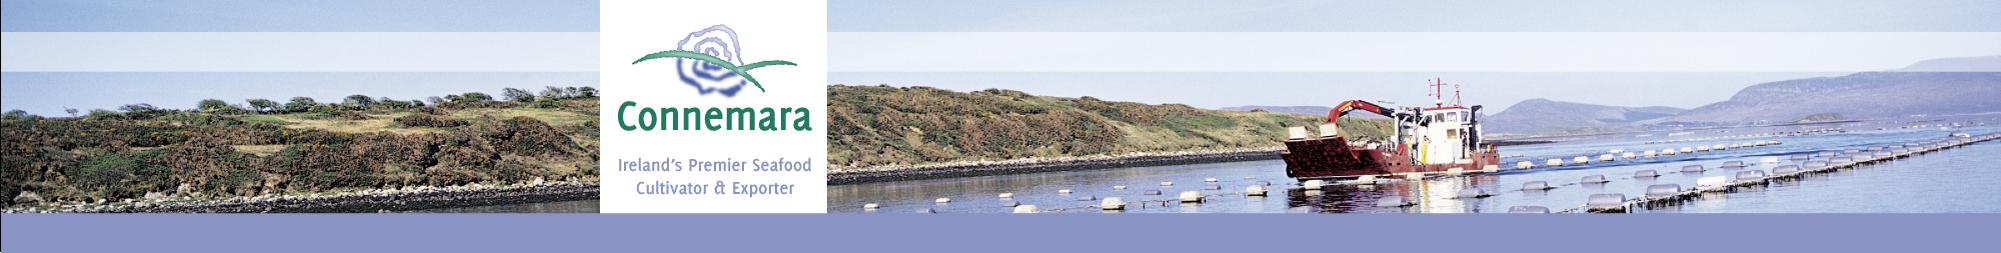 Connemara Blog